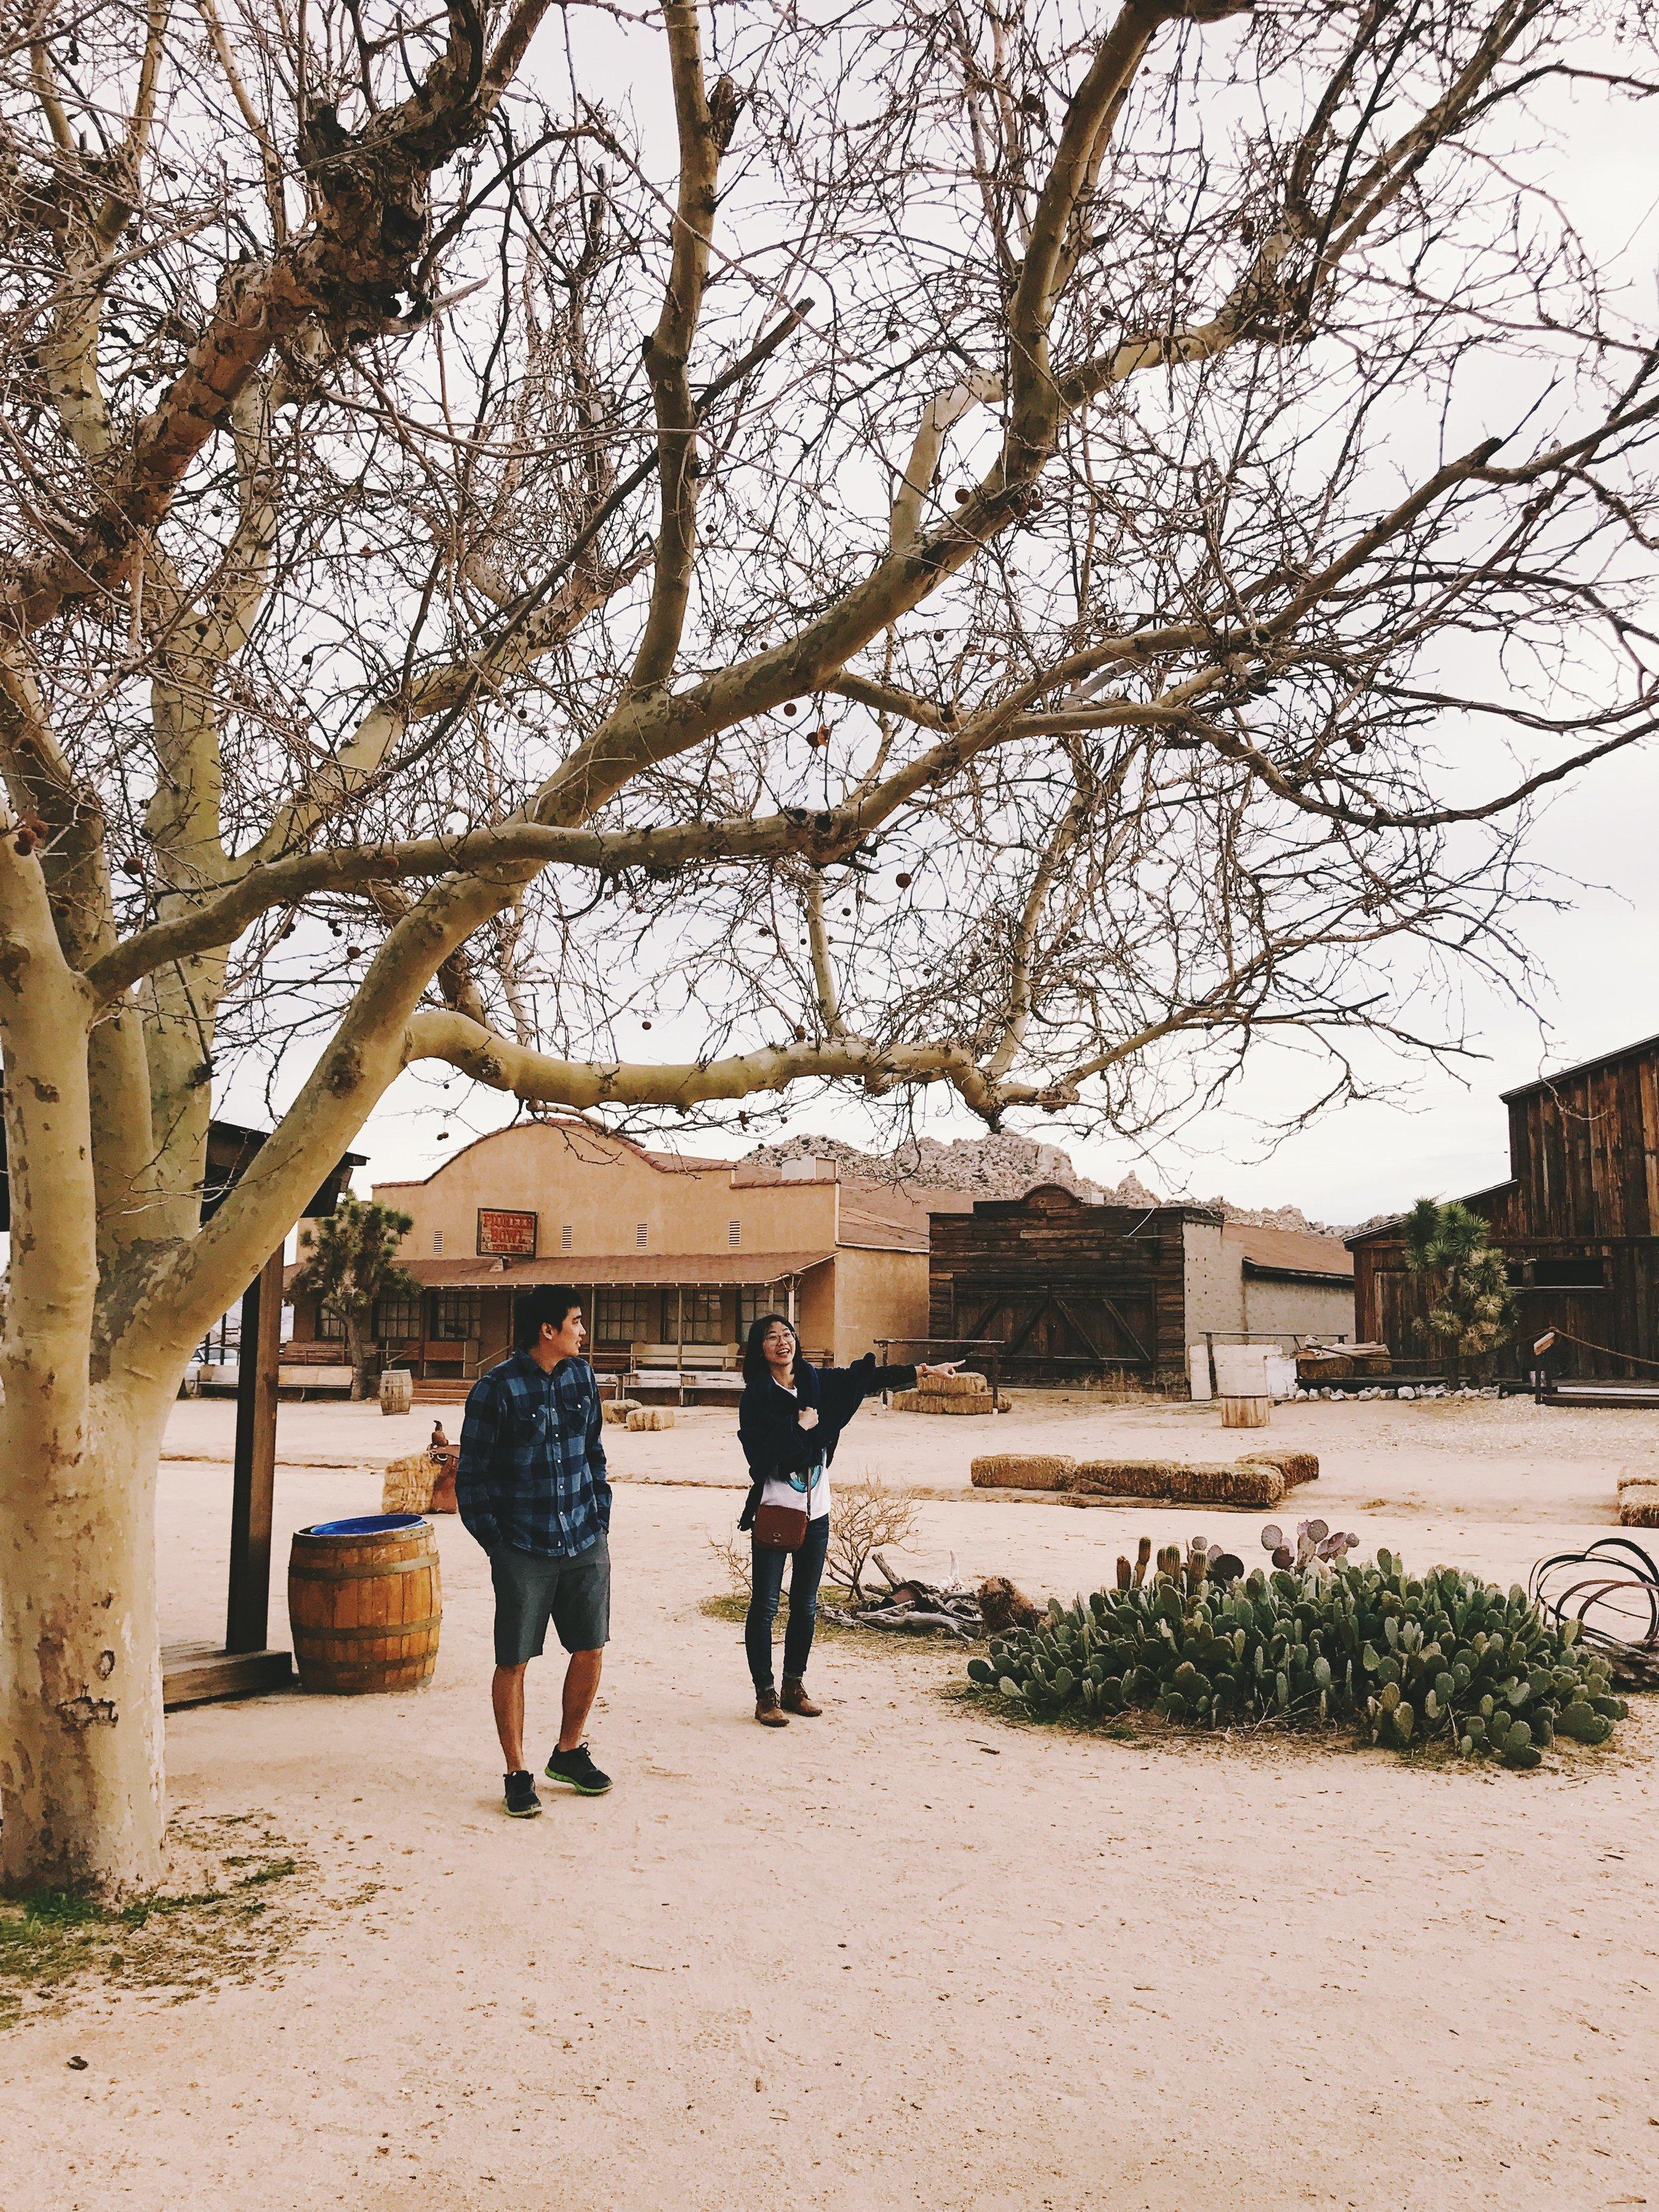 pioneertown joshua tree